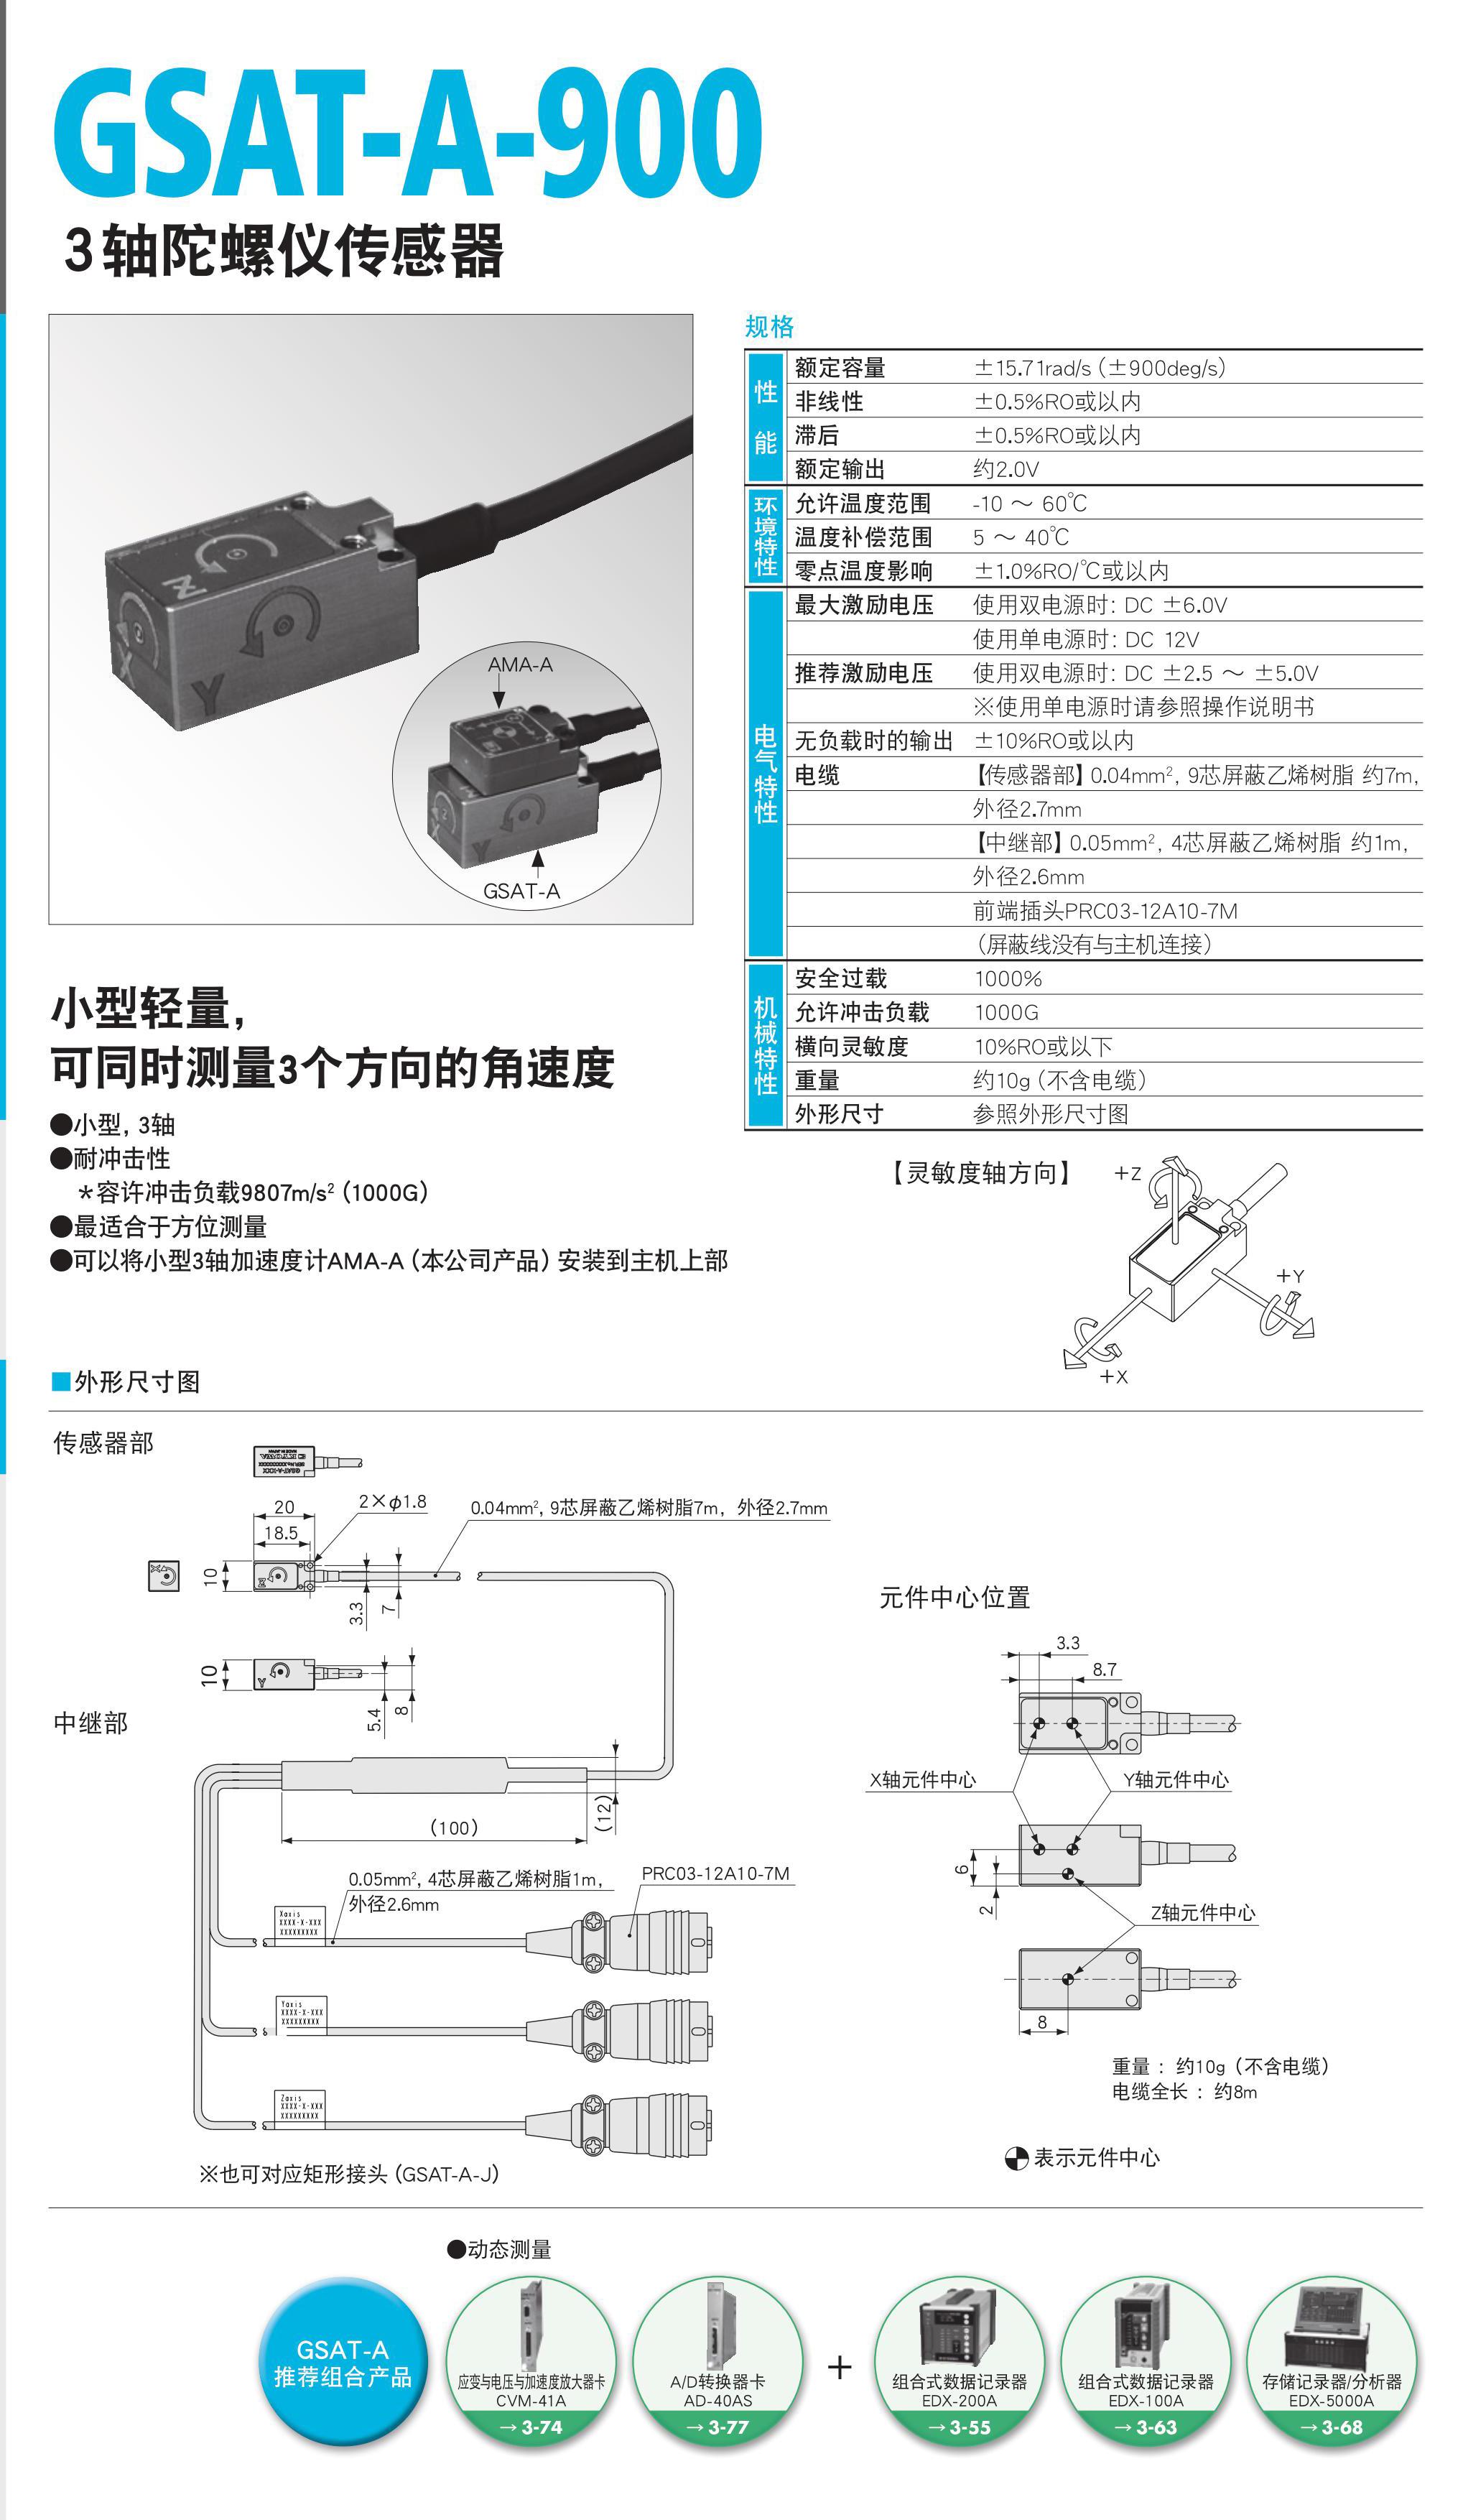 GSAT-A-9003轴陀螺仪传感器日本kyowa